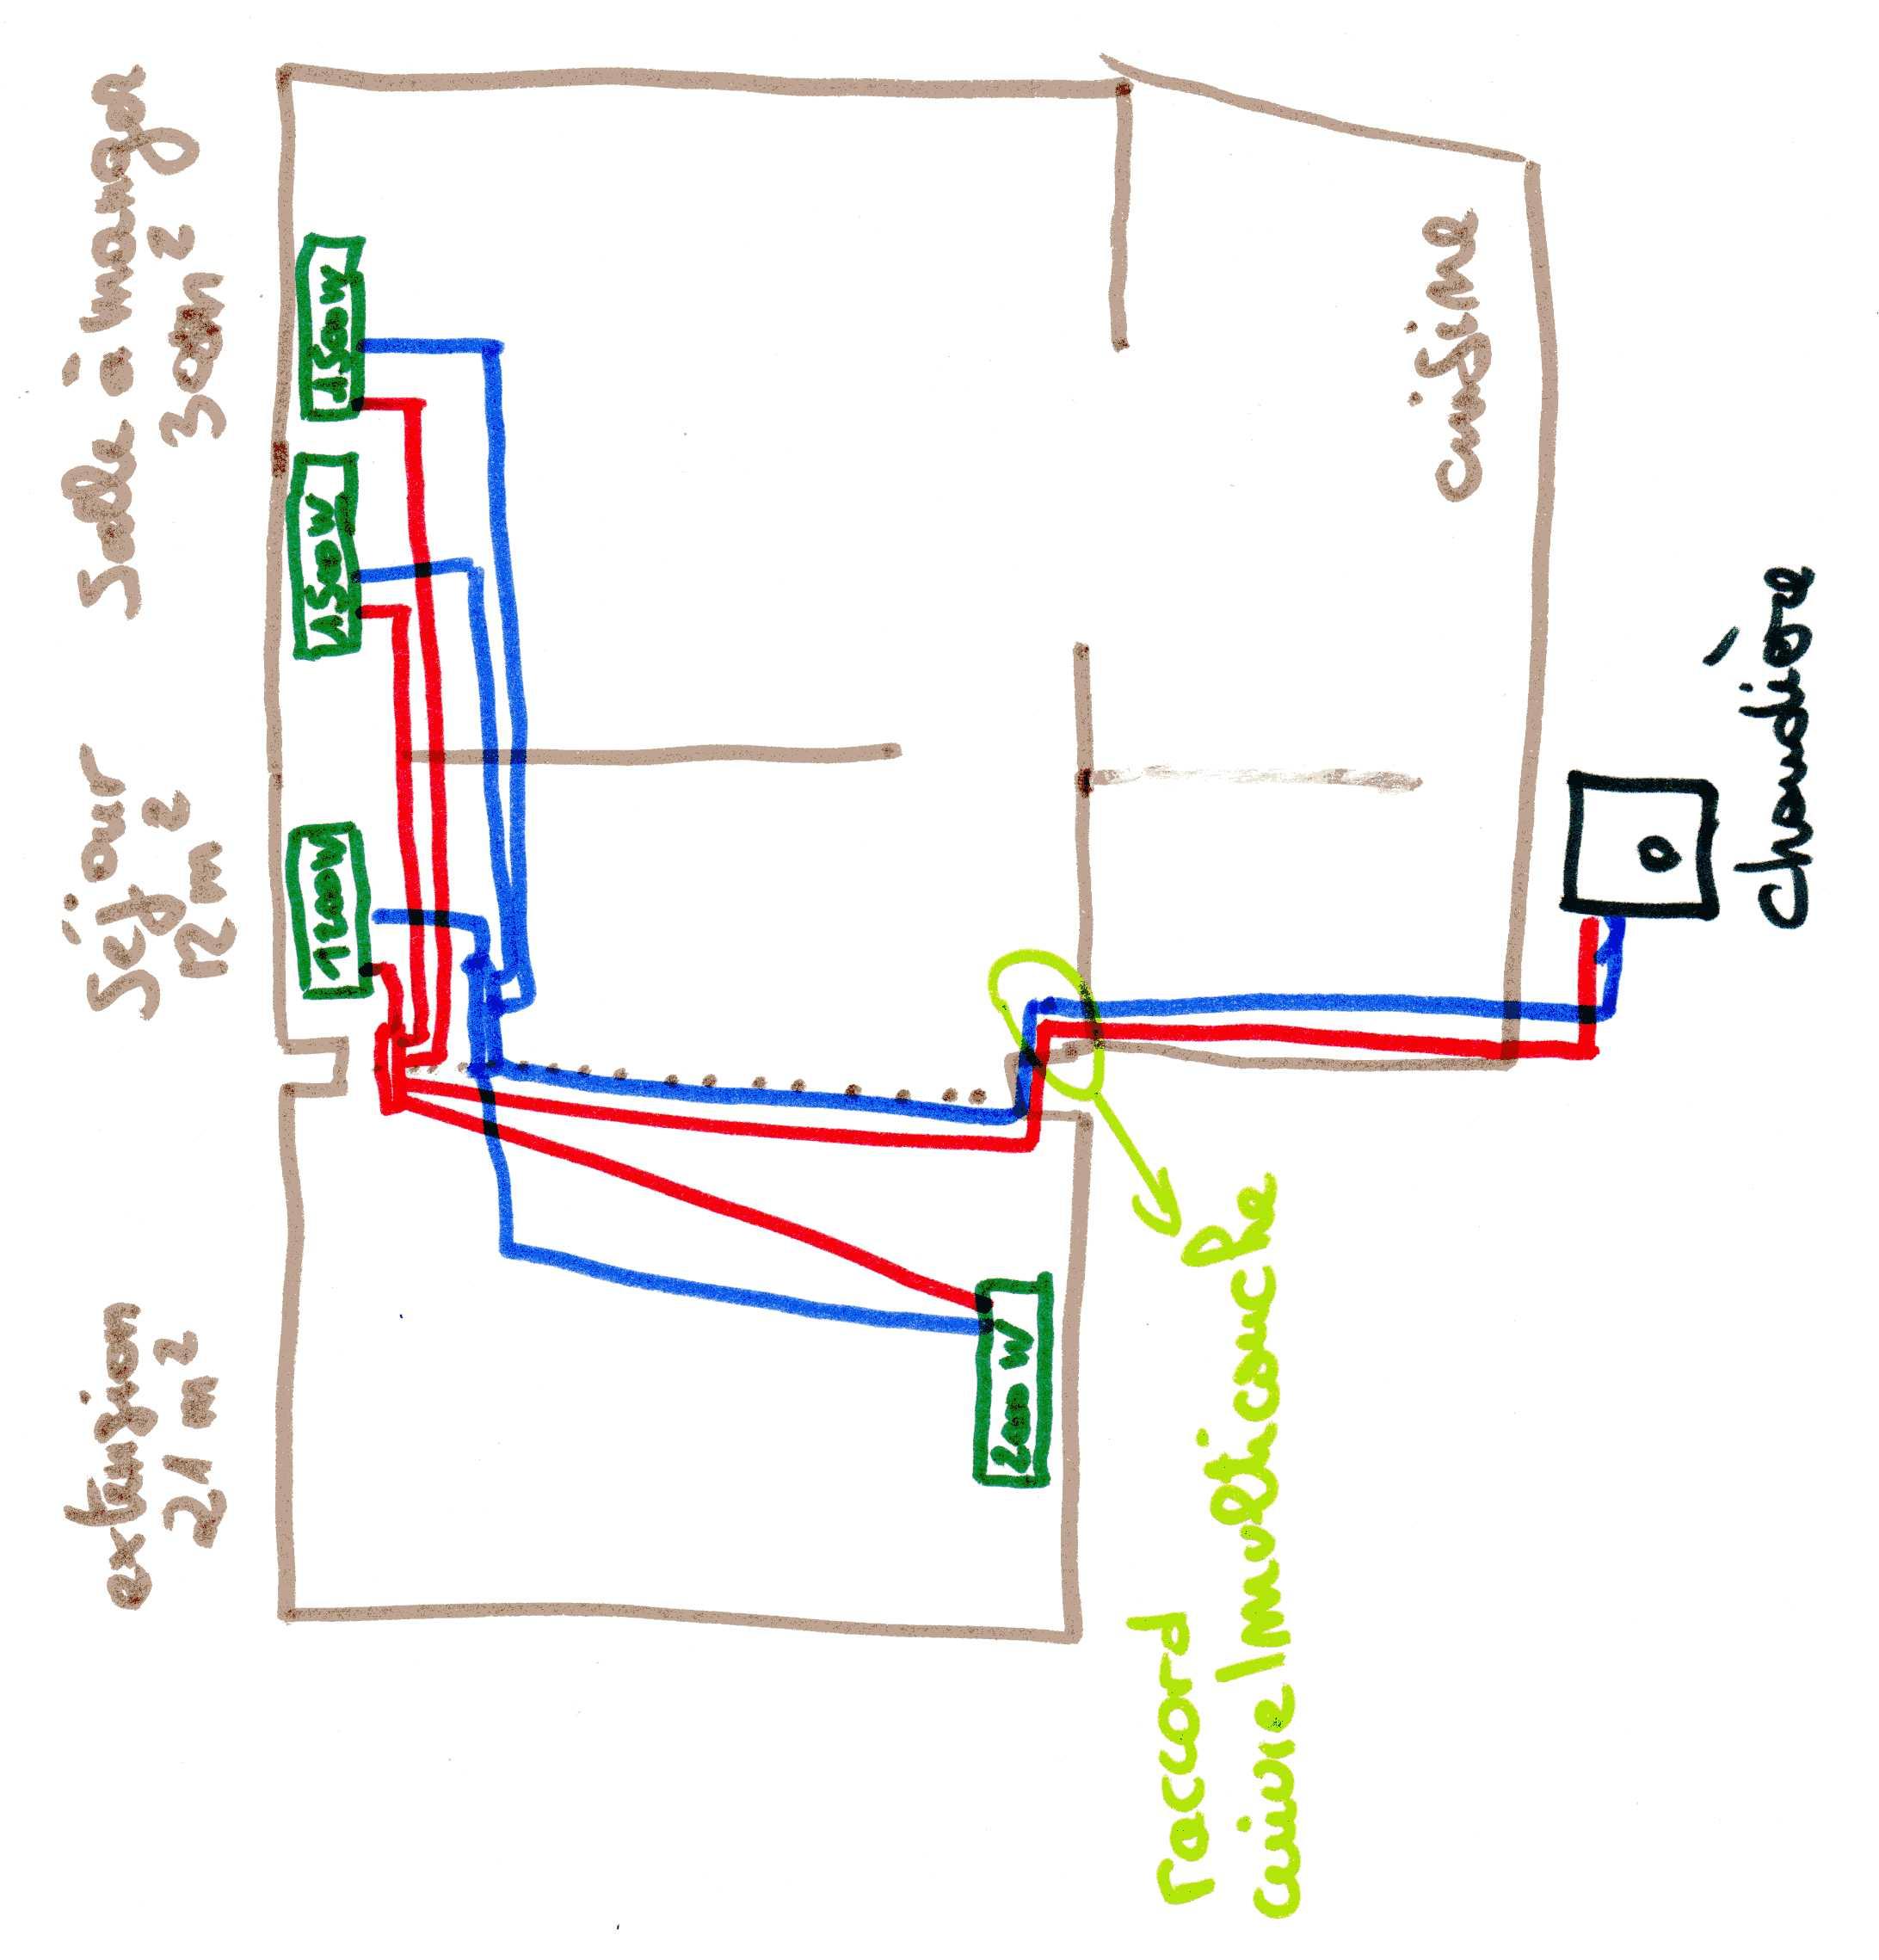 Plan Installation.jpg, 209.17 kb, 2184 x 2278